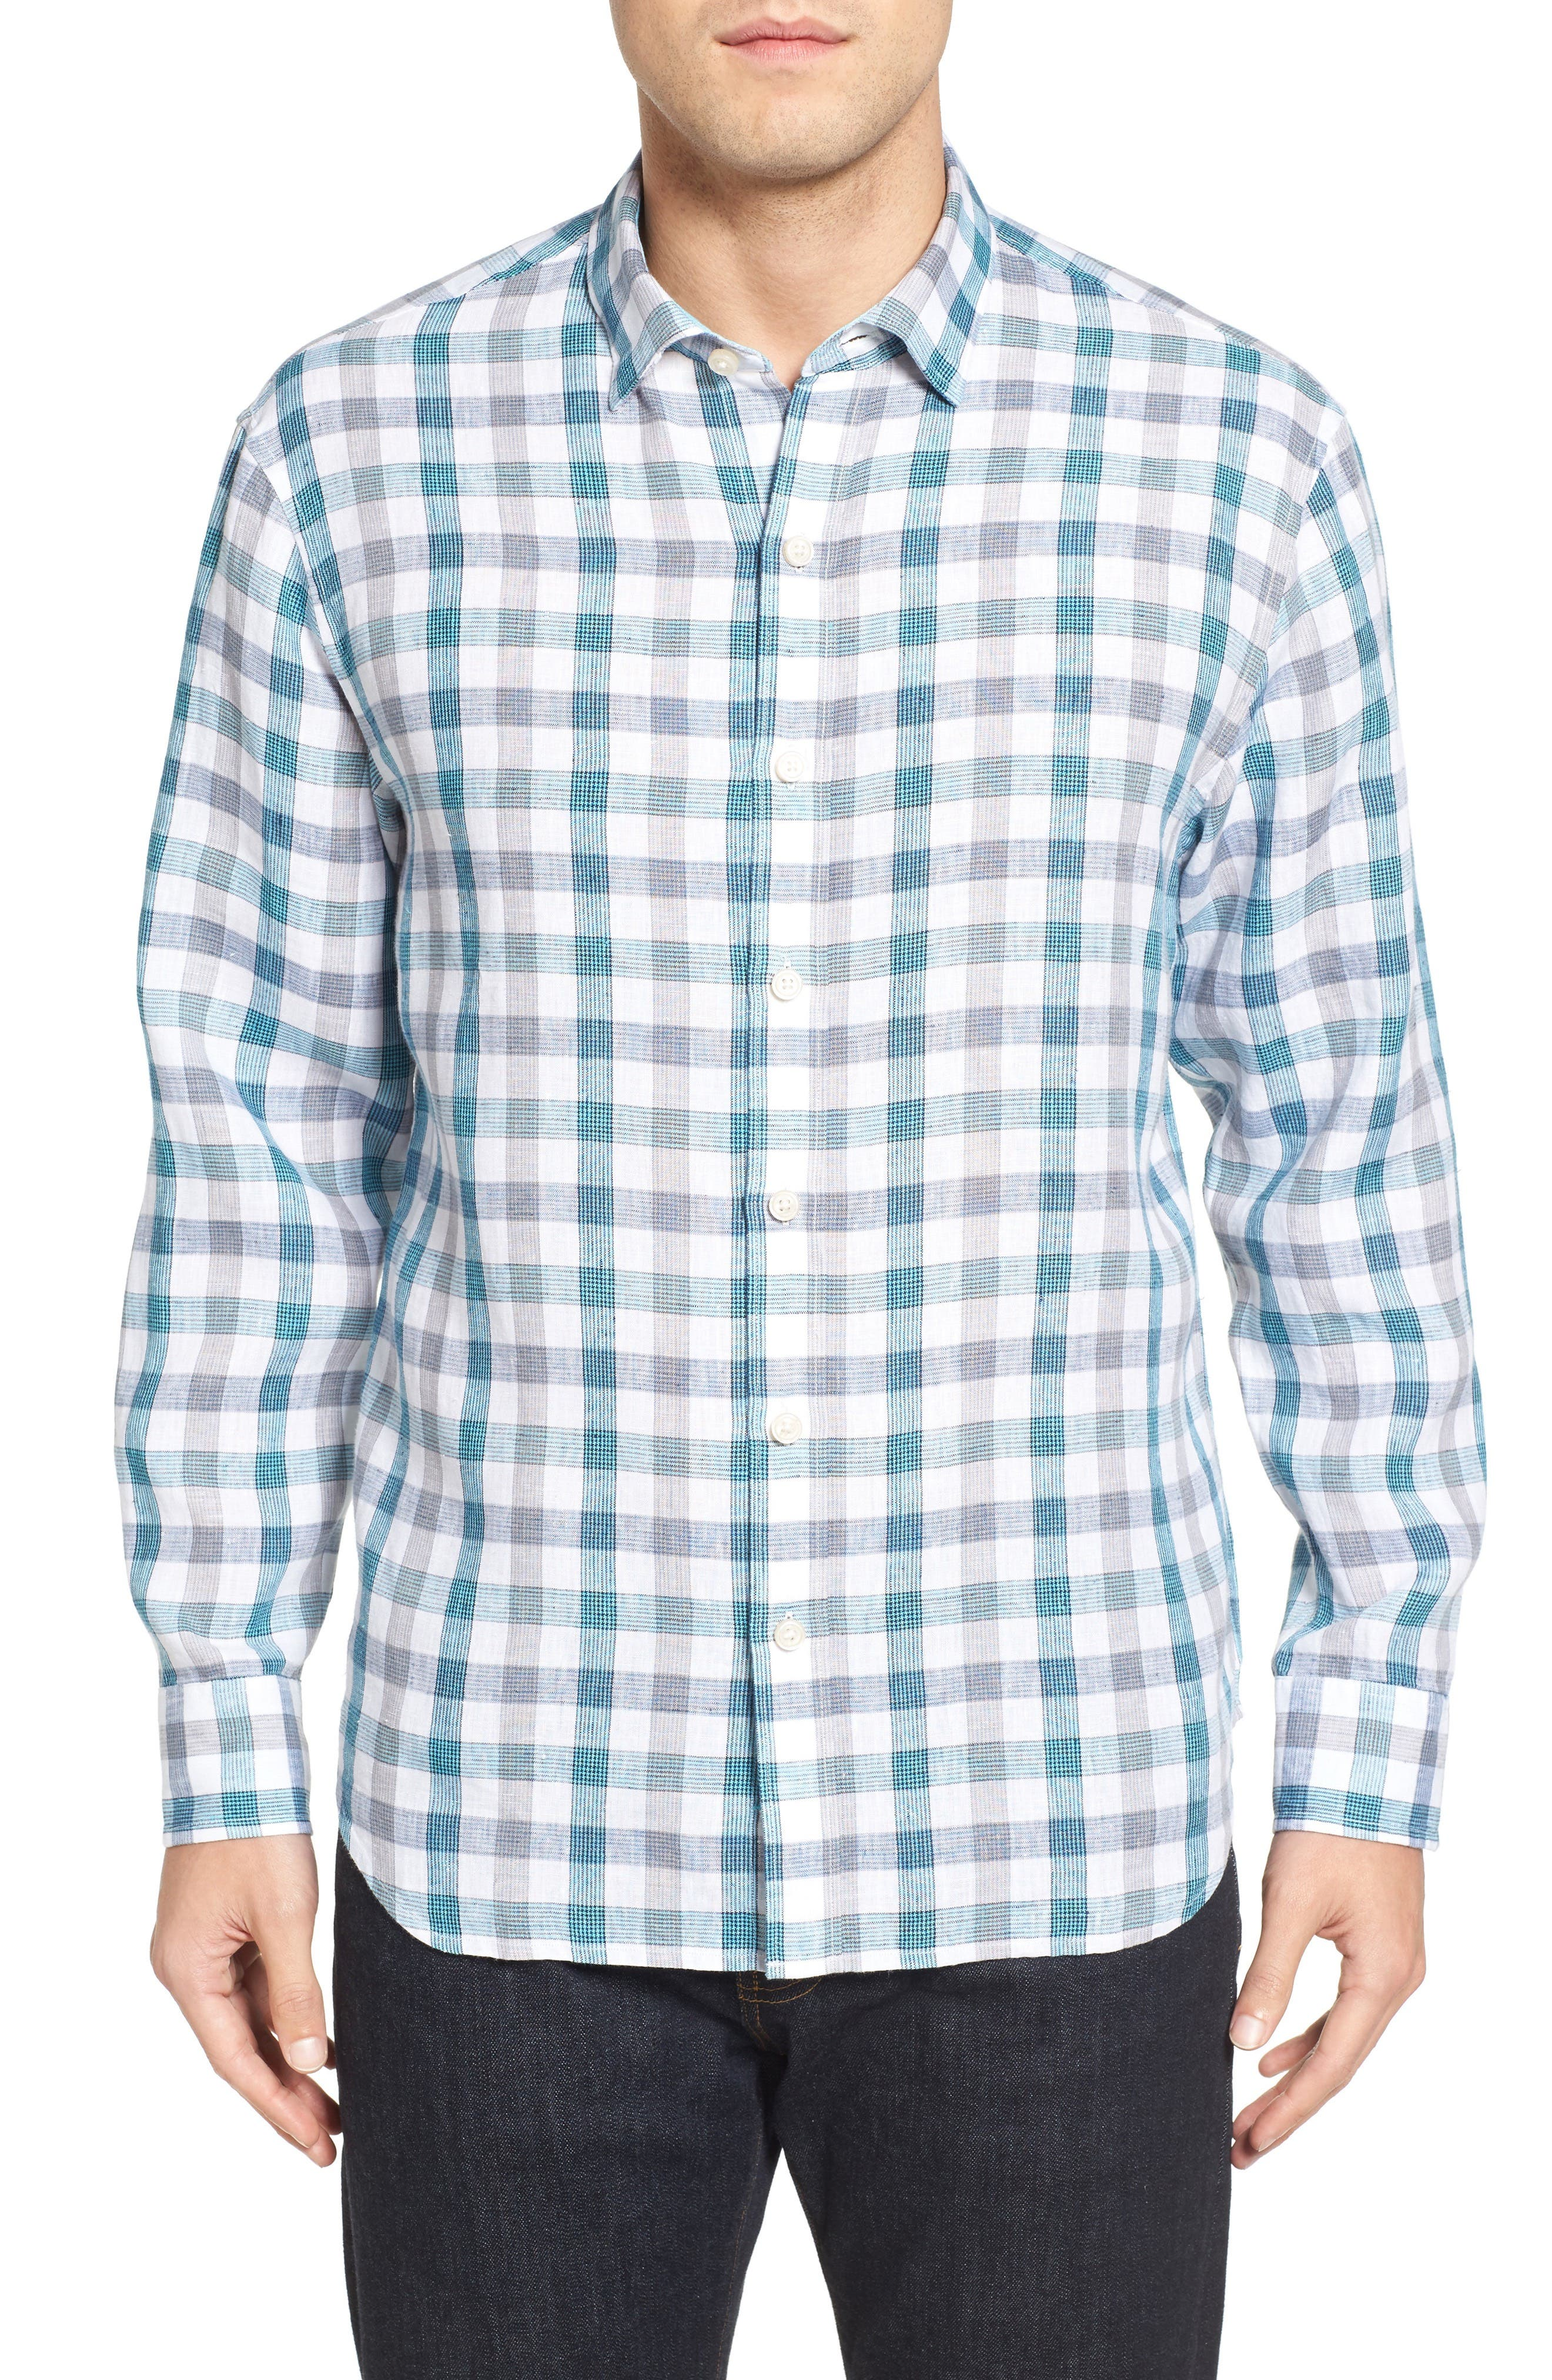 Thira Check Linen Sport Shirt,                         Main,                         color,